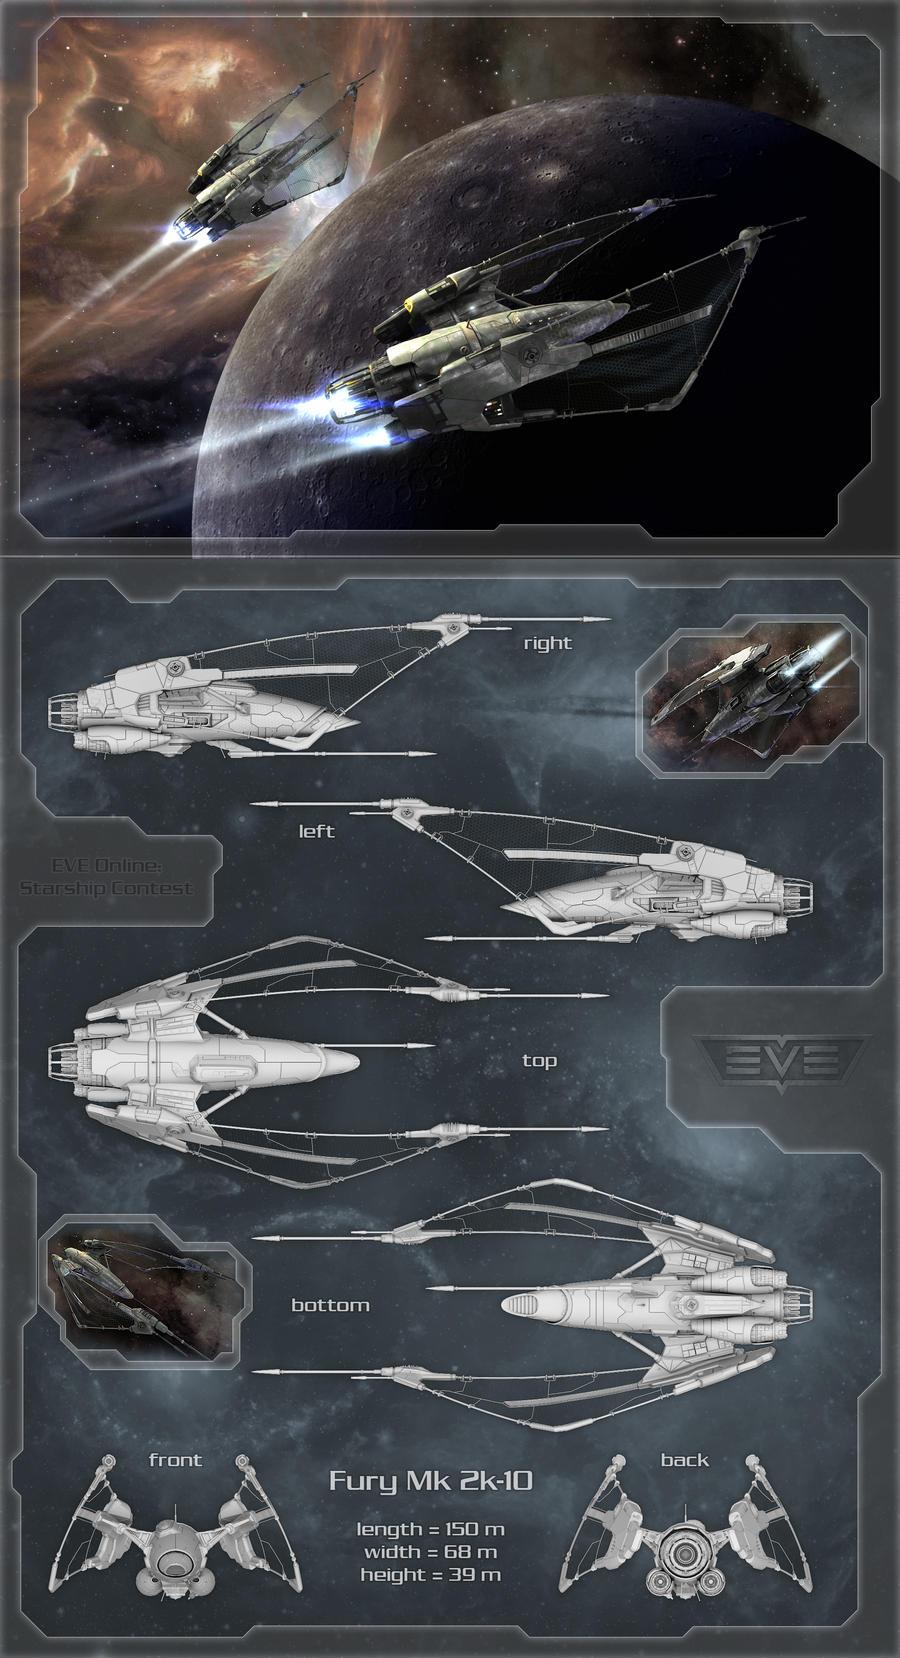 Fury Mk 2k-10 by galsogramma